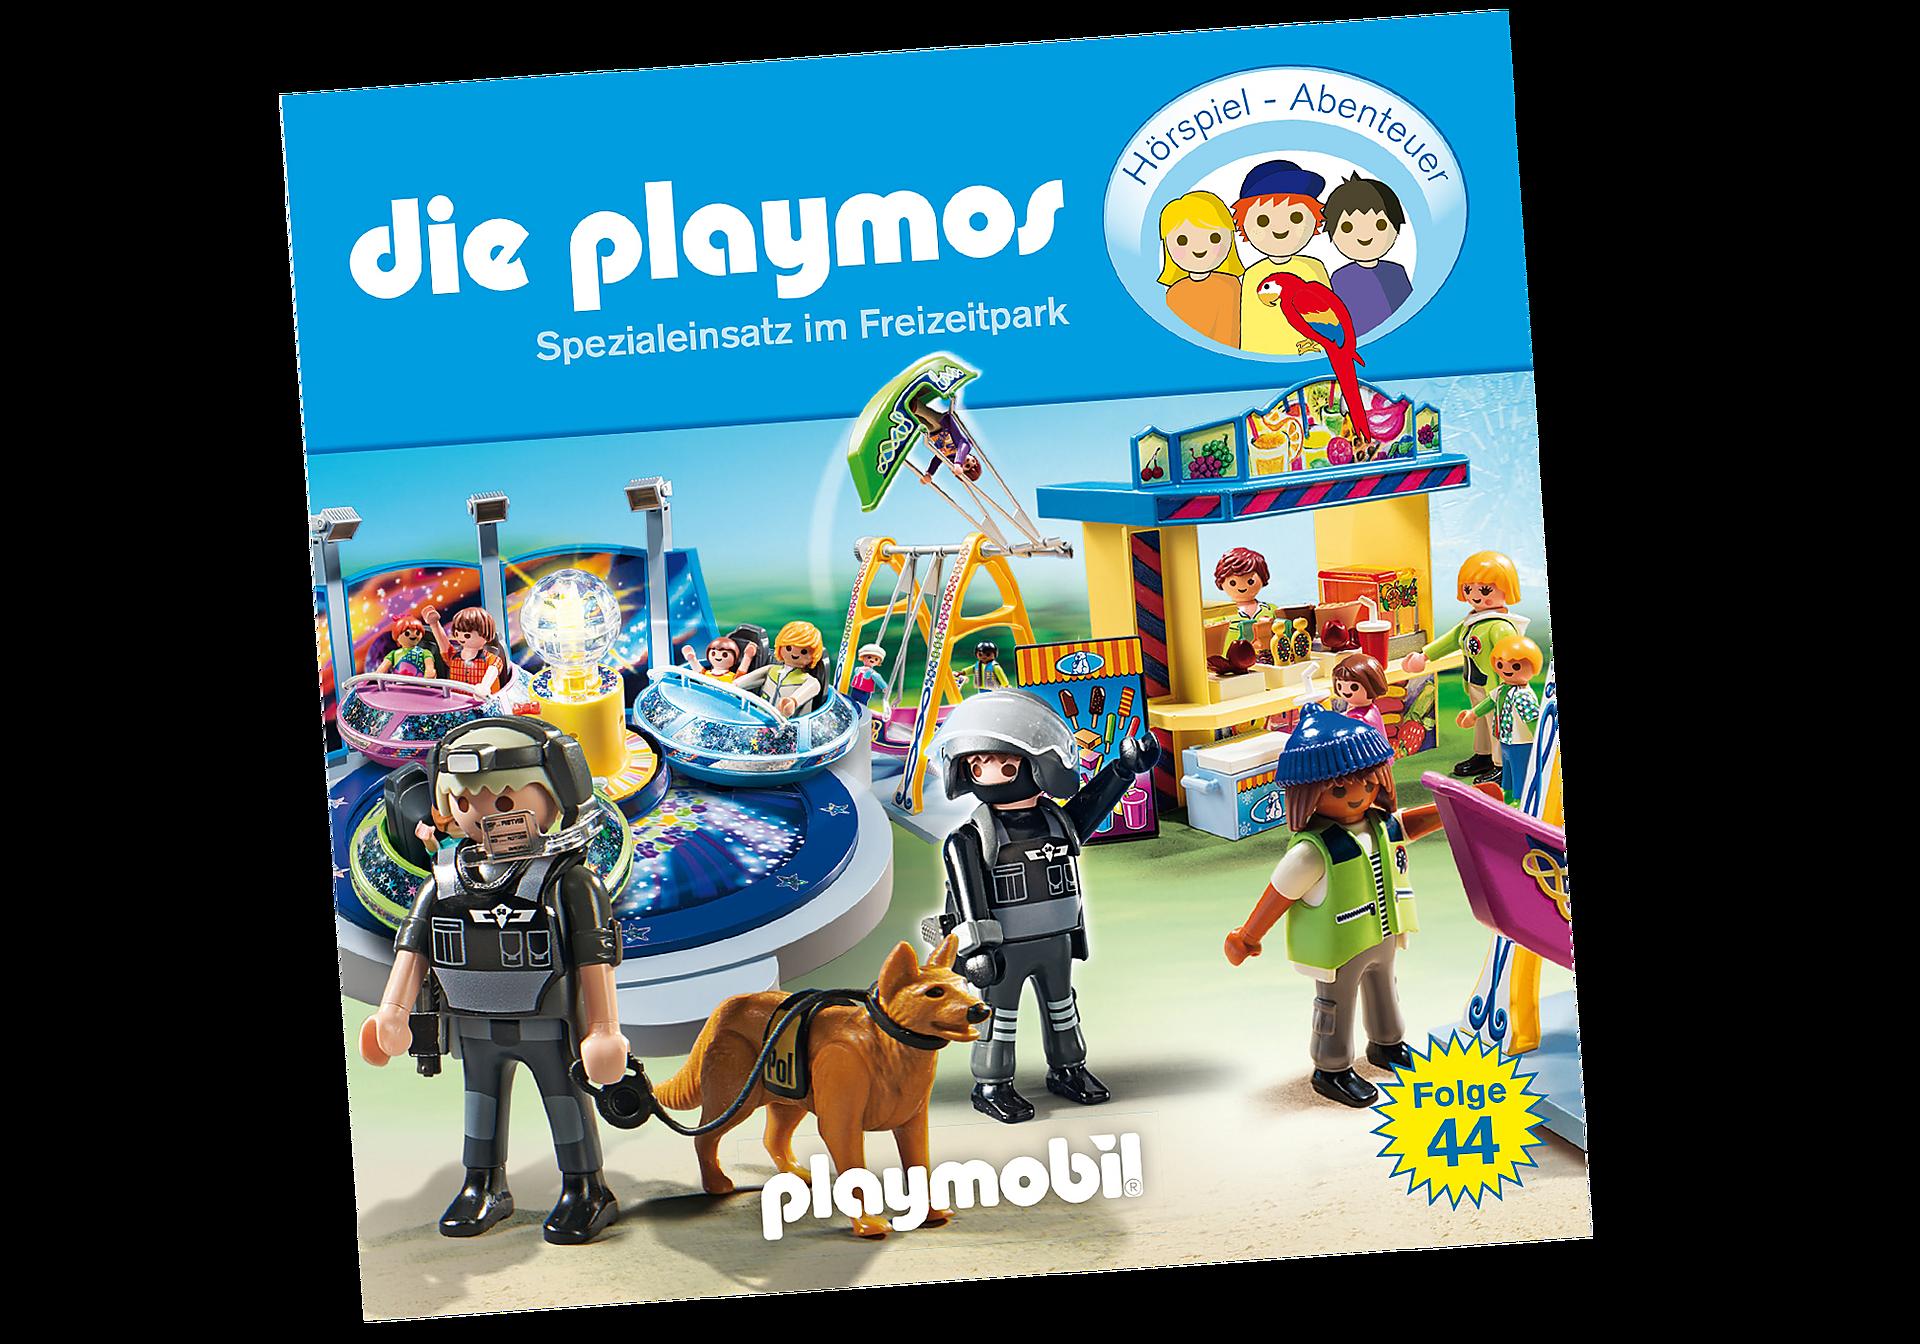 http://media.playmobil.com/i/playmobil/80457_product_detail/Sondereinsatz Freizeitpark! - Folge 44